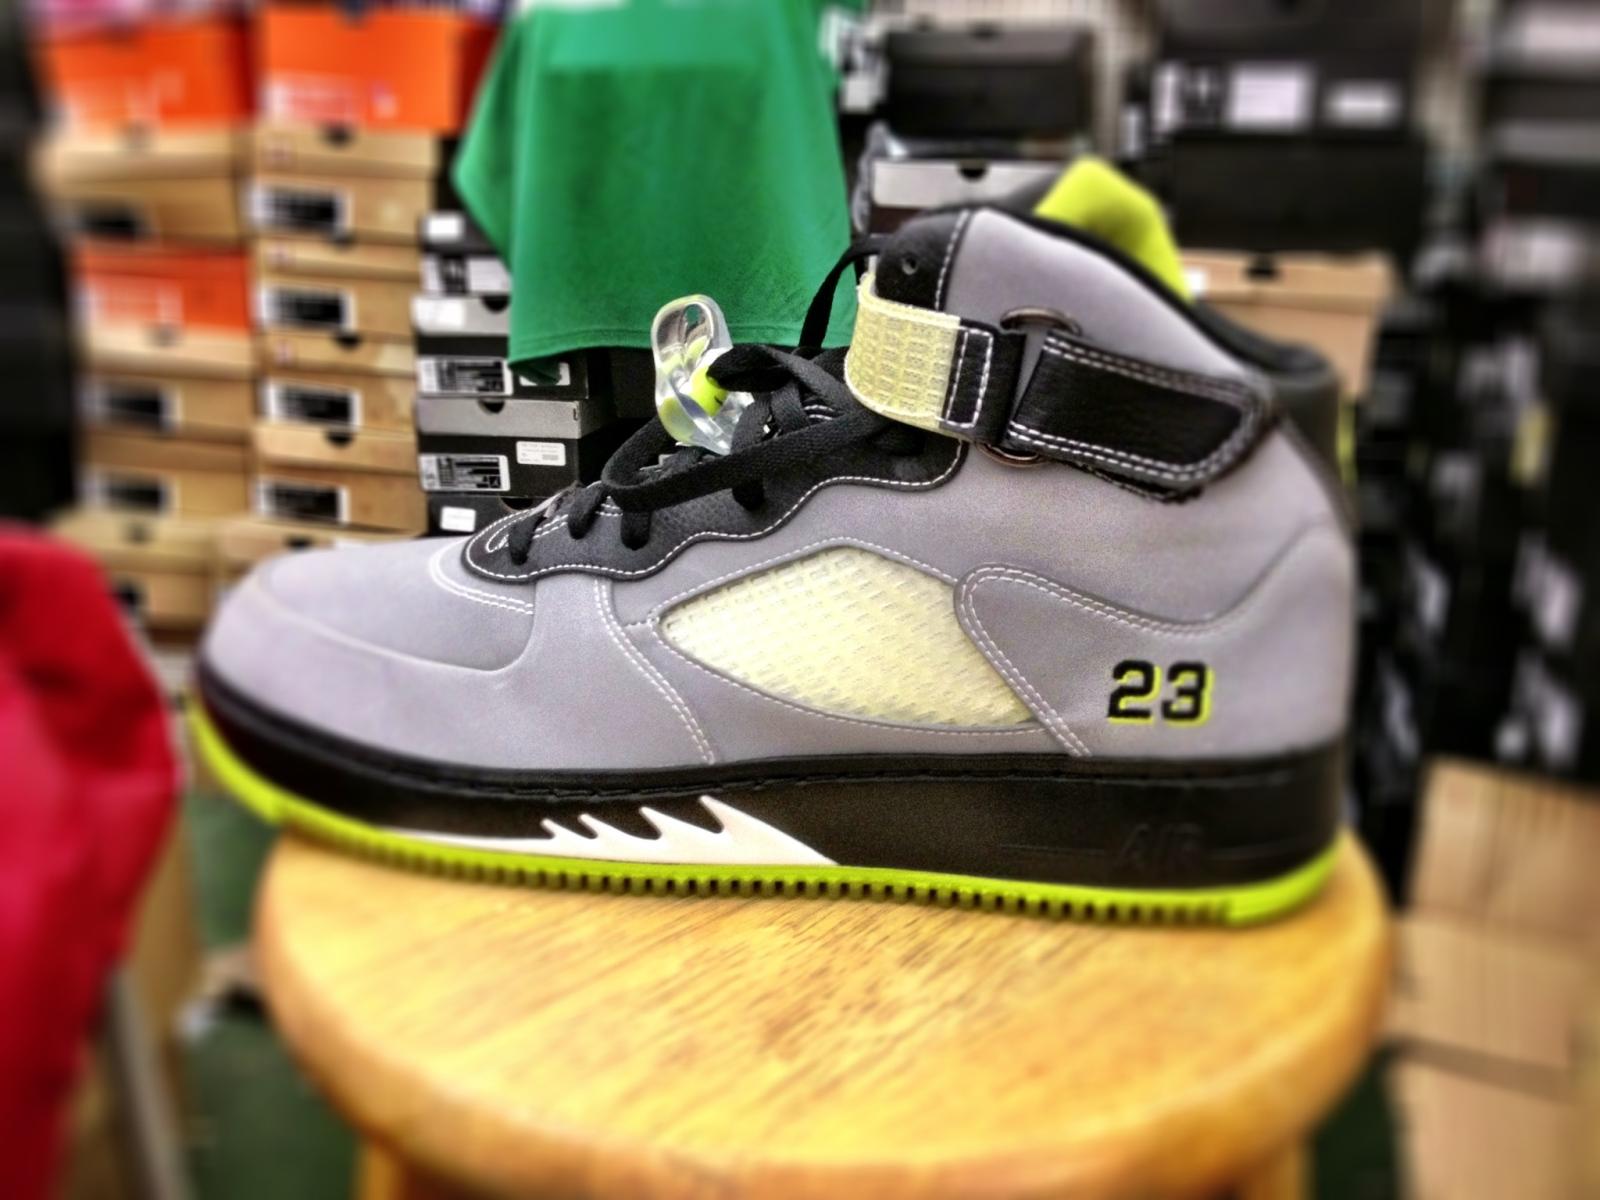 Air Jordan 5 and Air Force 1 Fusion